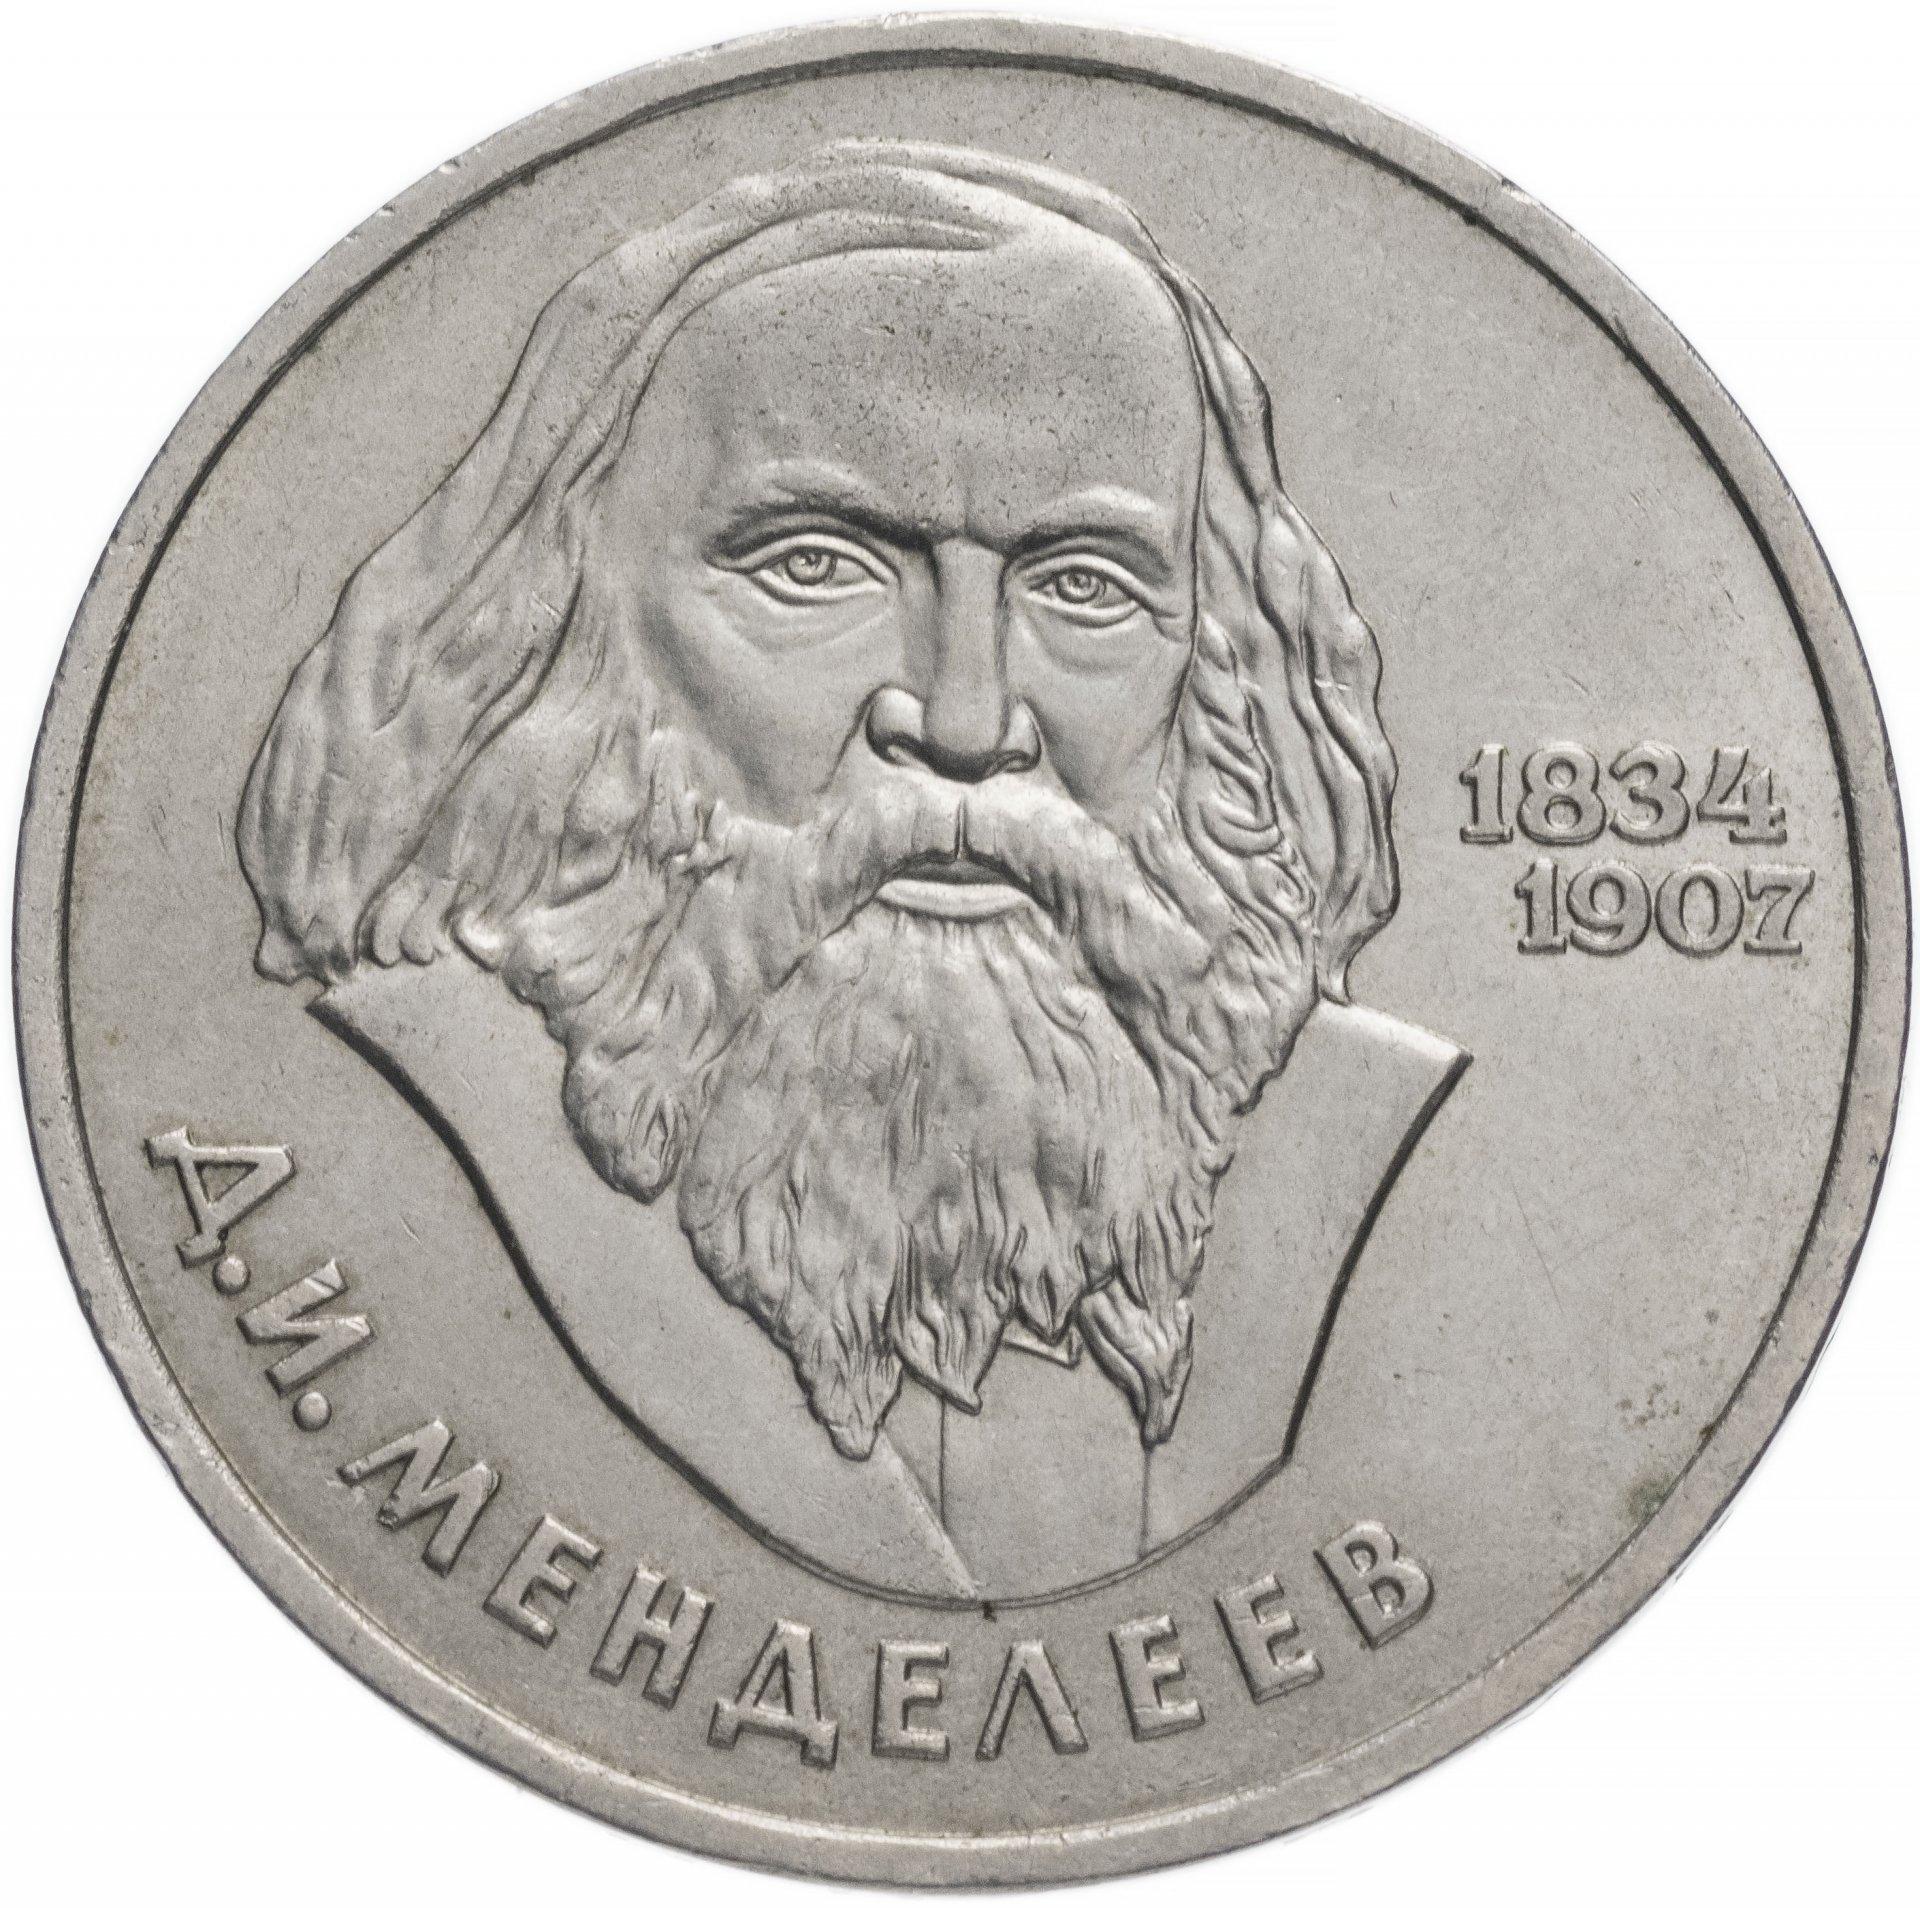 1 рубль - Менделеев